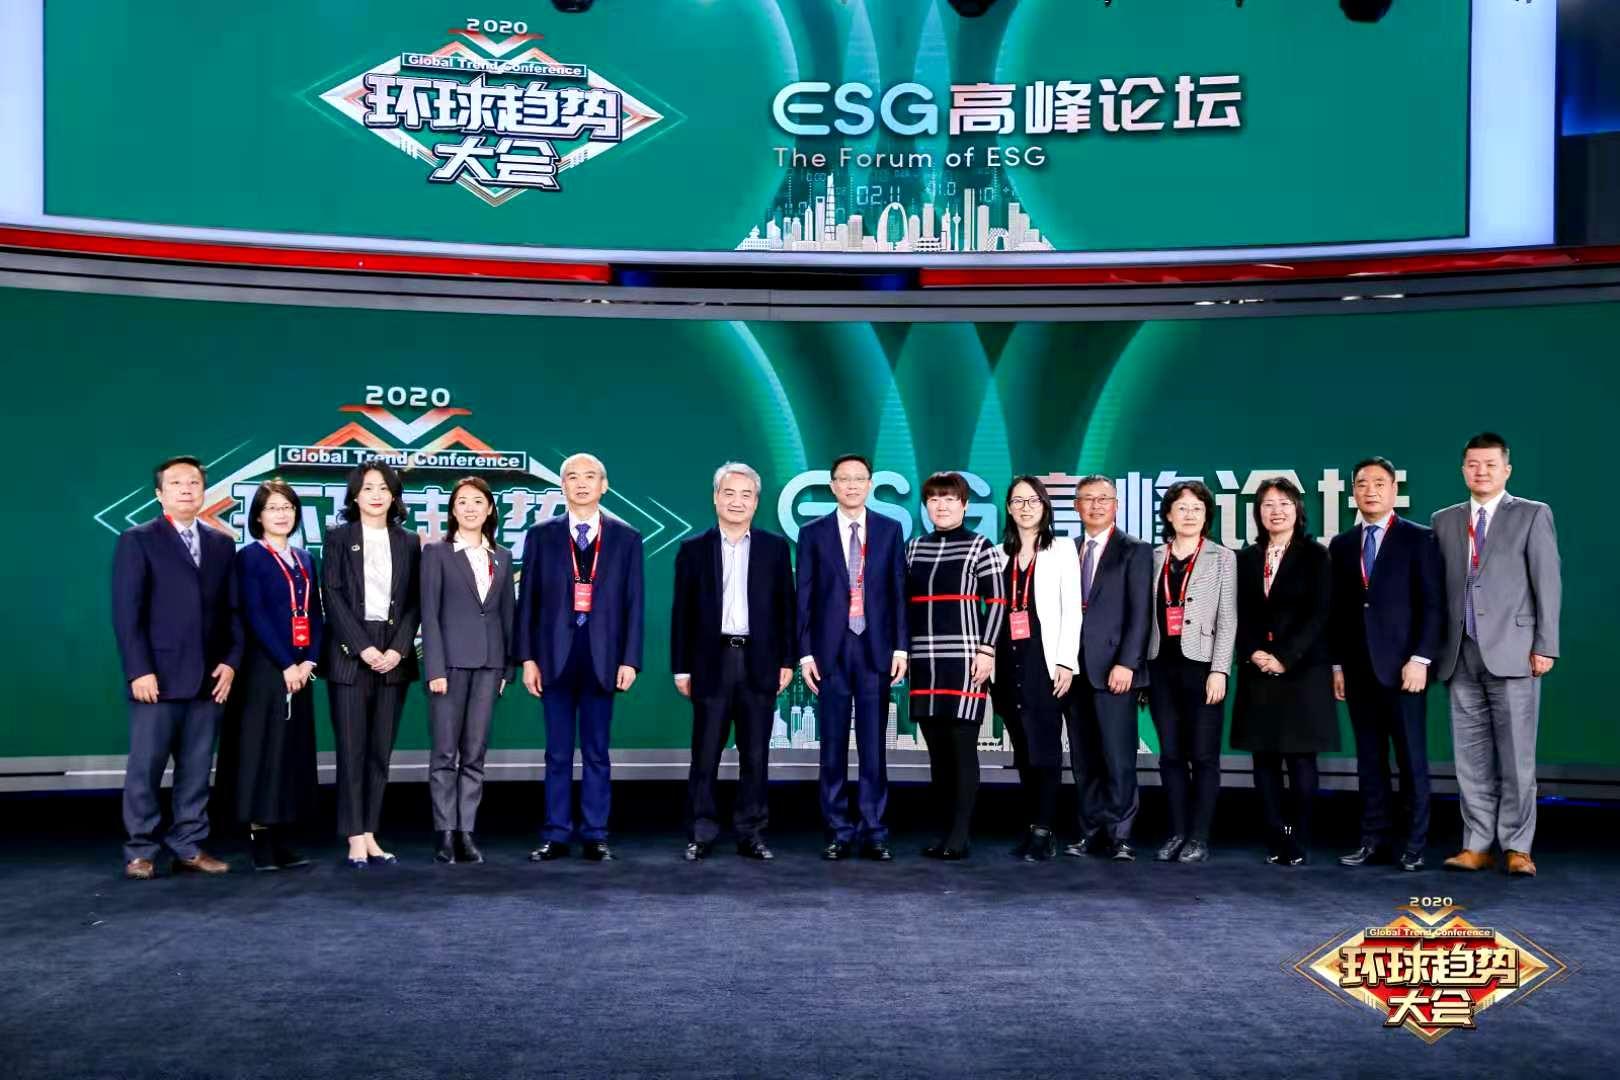 ESG高峰论坛